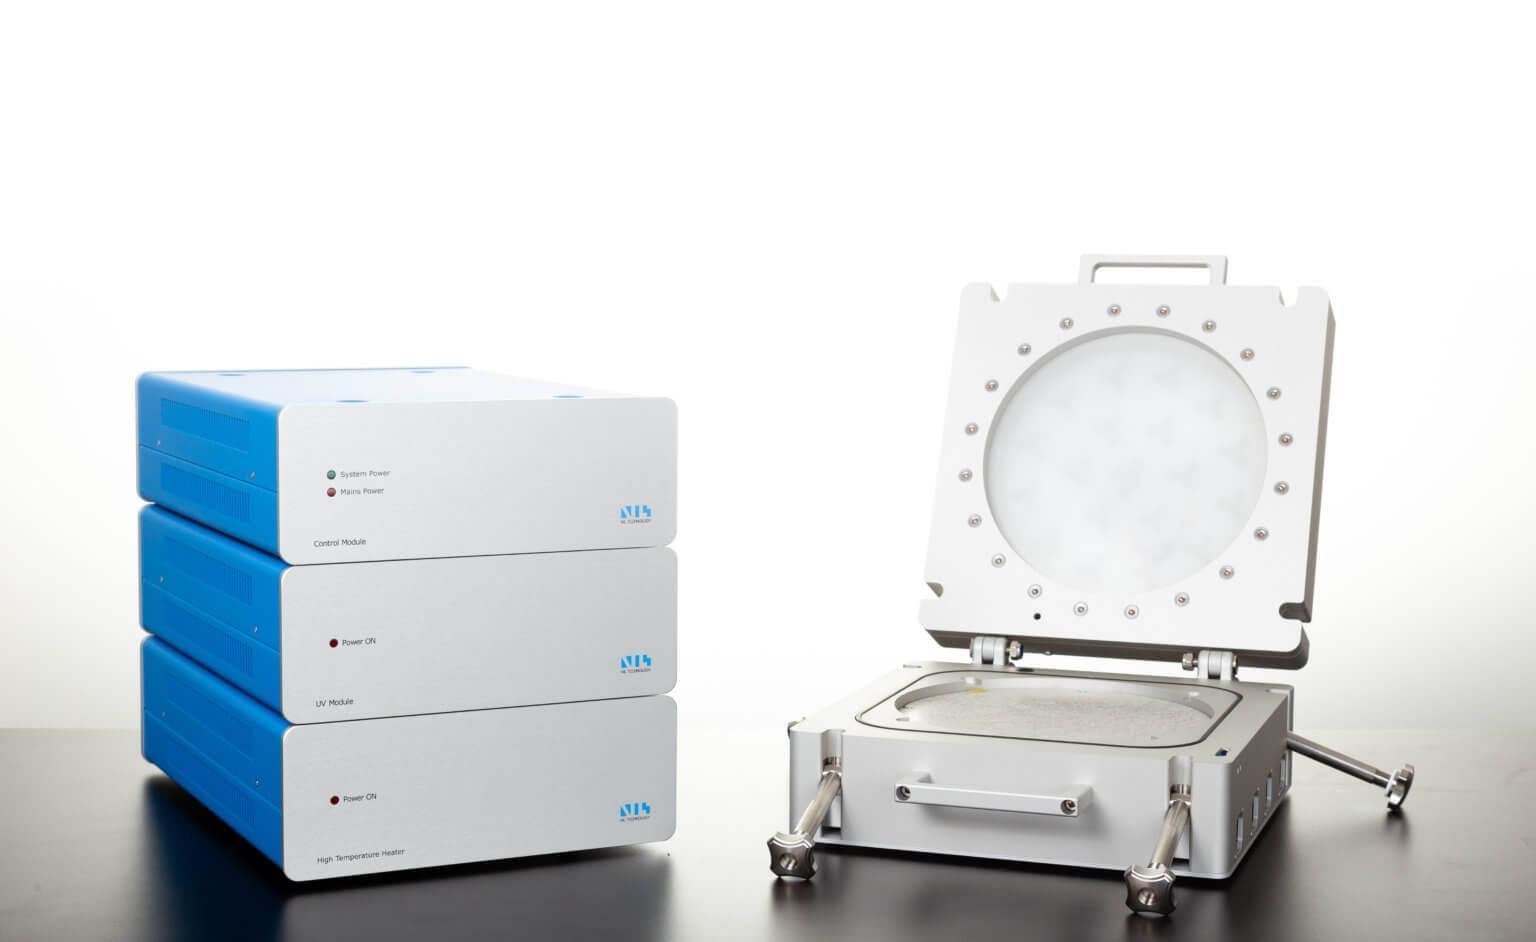 CNI v3.0, nanoimprint tool, 210 mm version